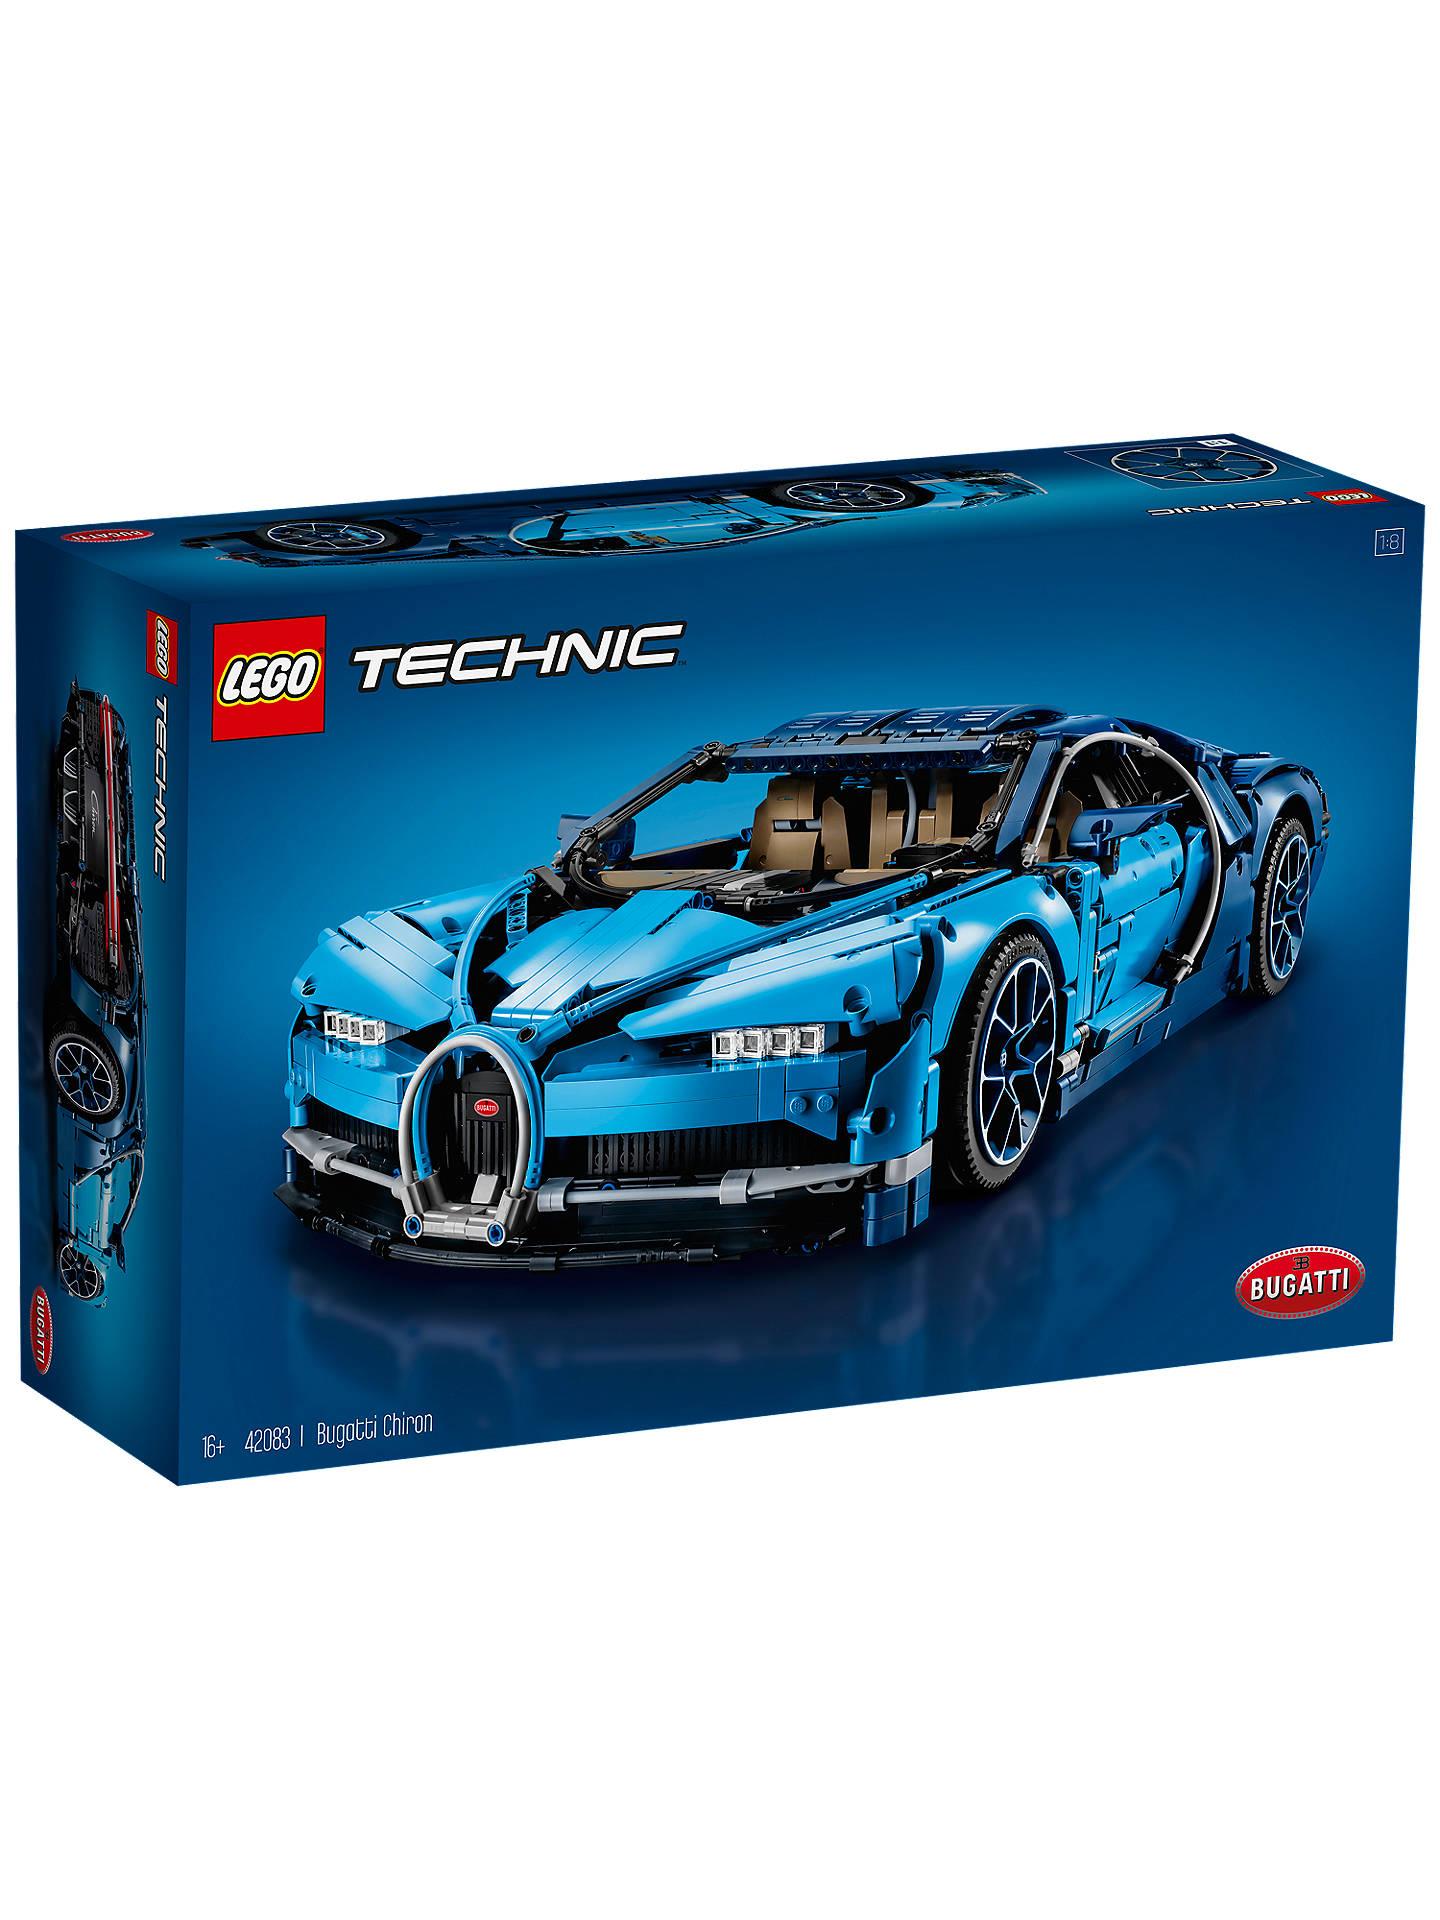 LEGO Technic 42083 Bugatti Chiron Supercar £247.49 @ John Lewis & Partners